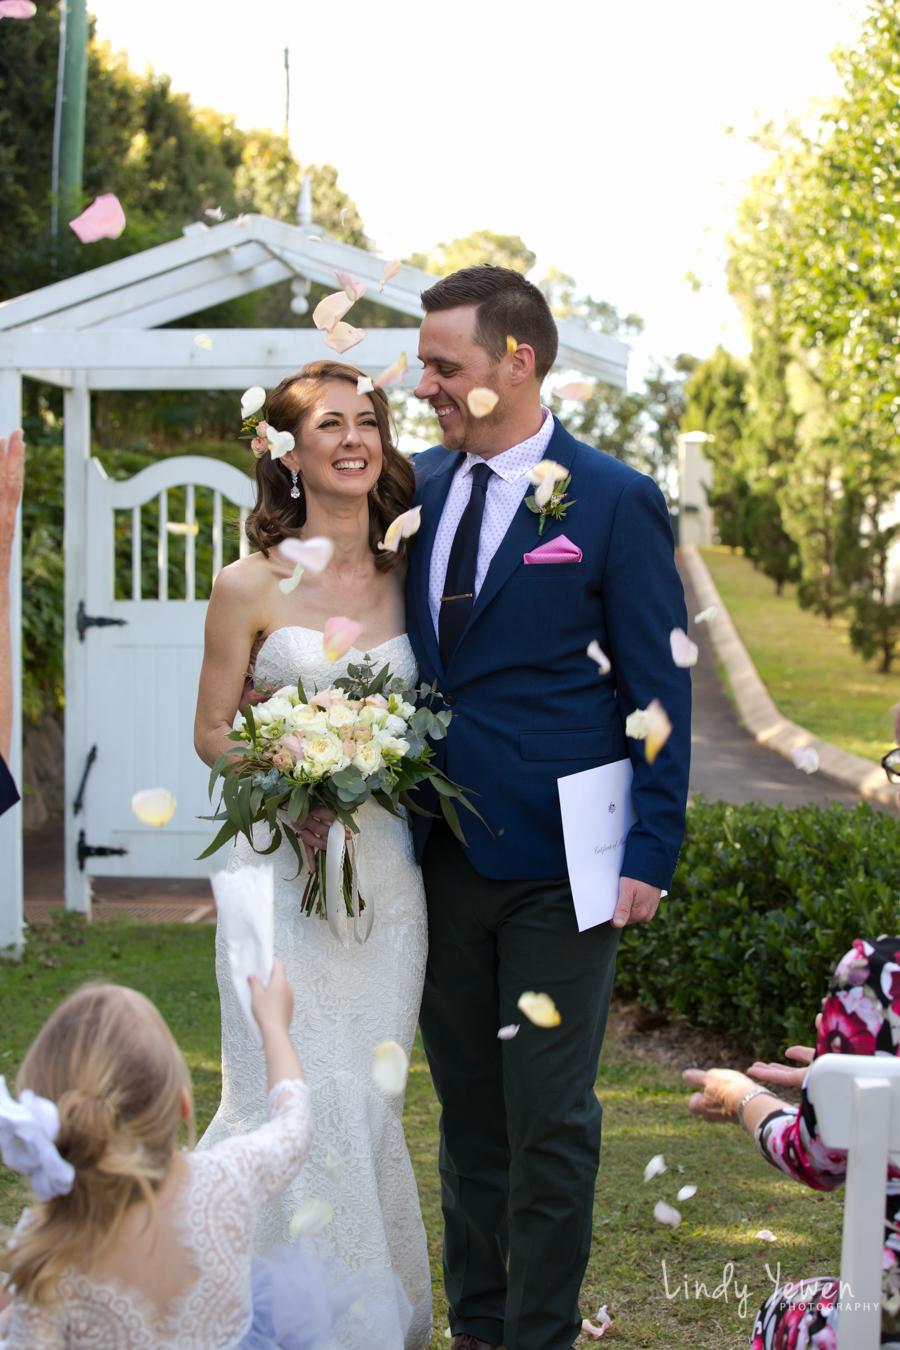 Montville-wedding-photographer-Lauren-Kirby 153.jpg